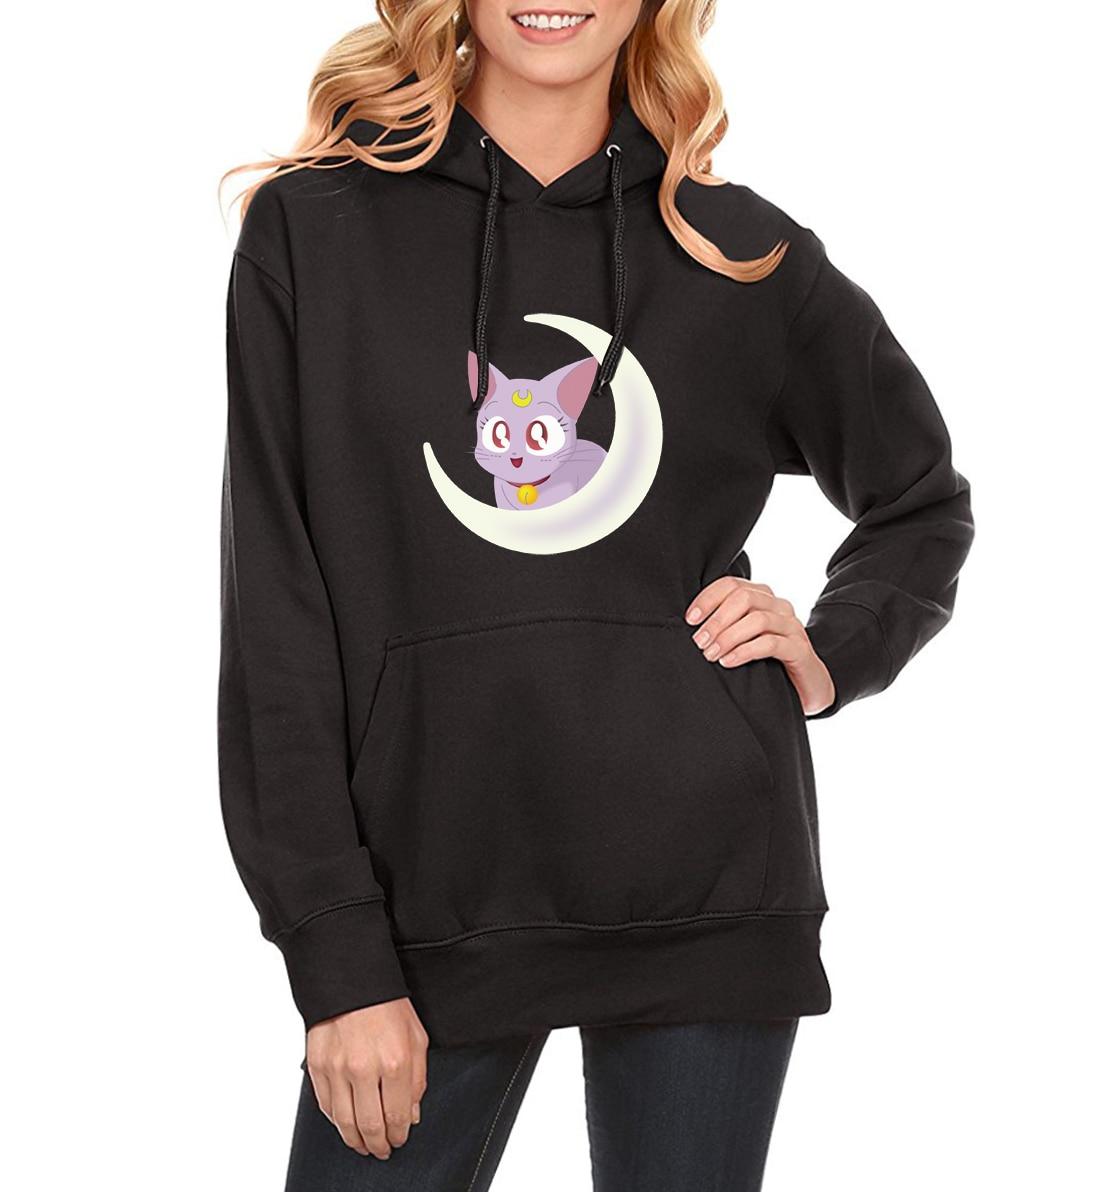 Hoodies For Women New 2019 Spring Fleece Winter Sweatshirt With Hat Print Sailor Moon Brand Hipster Harajuku Hoody Female Kpop